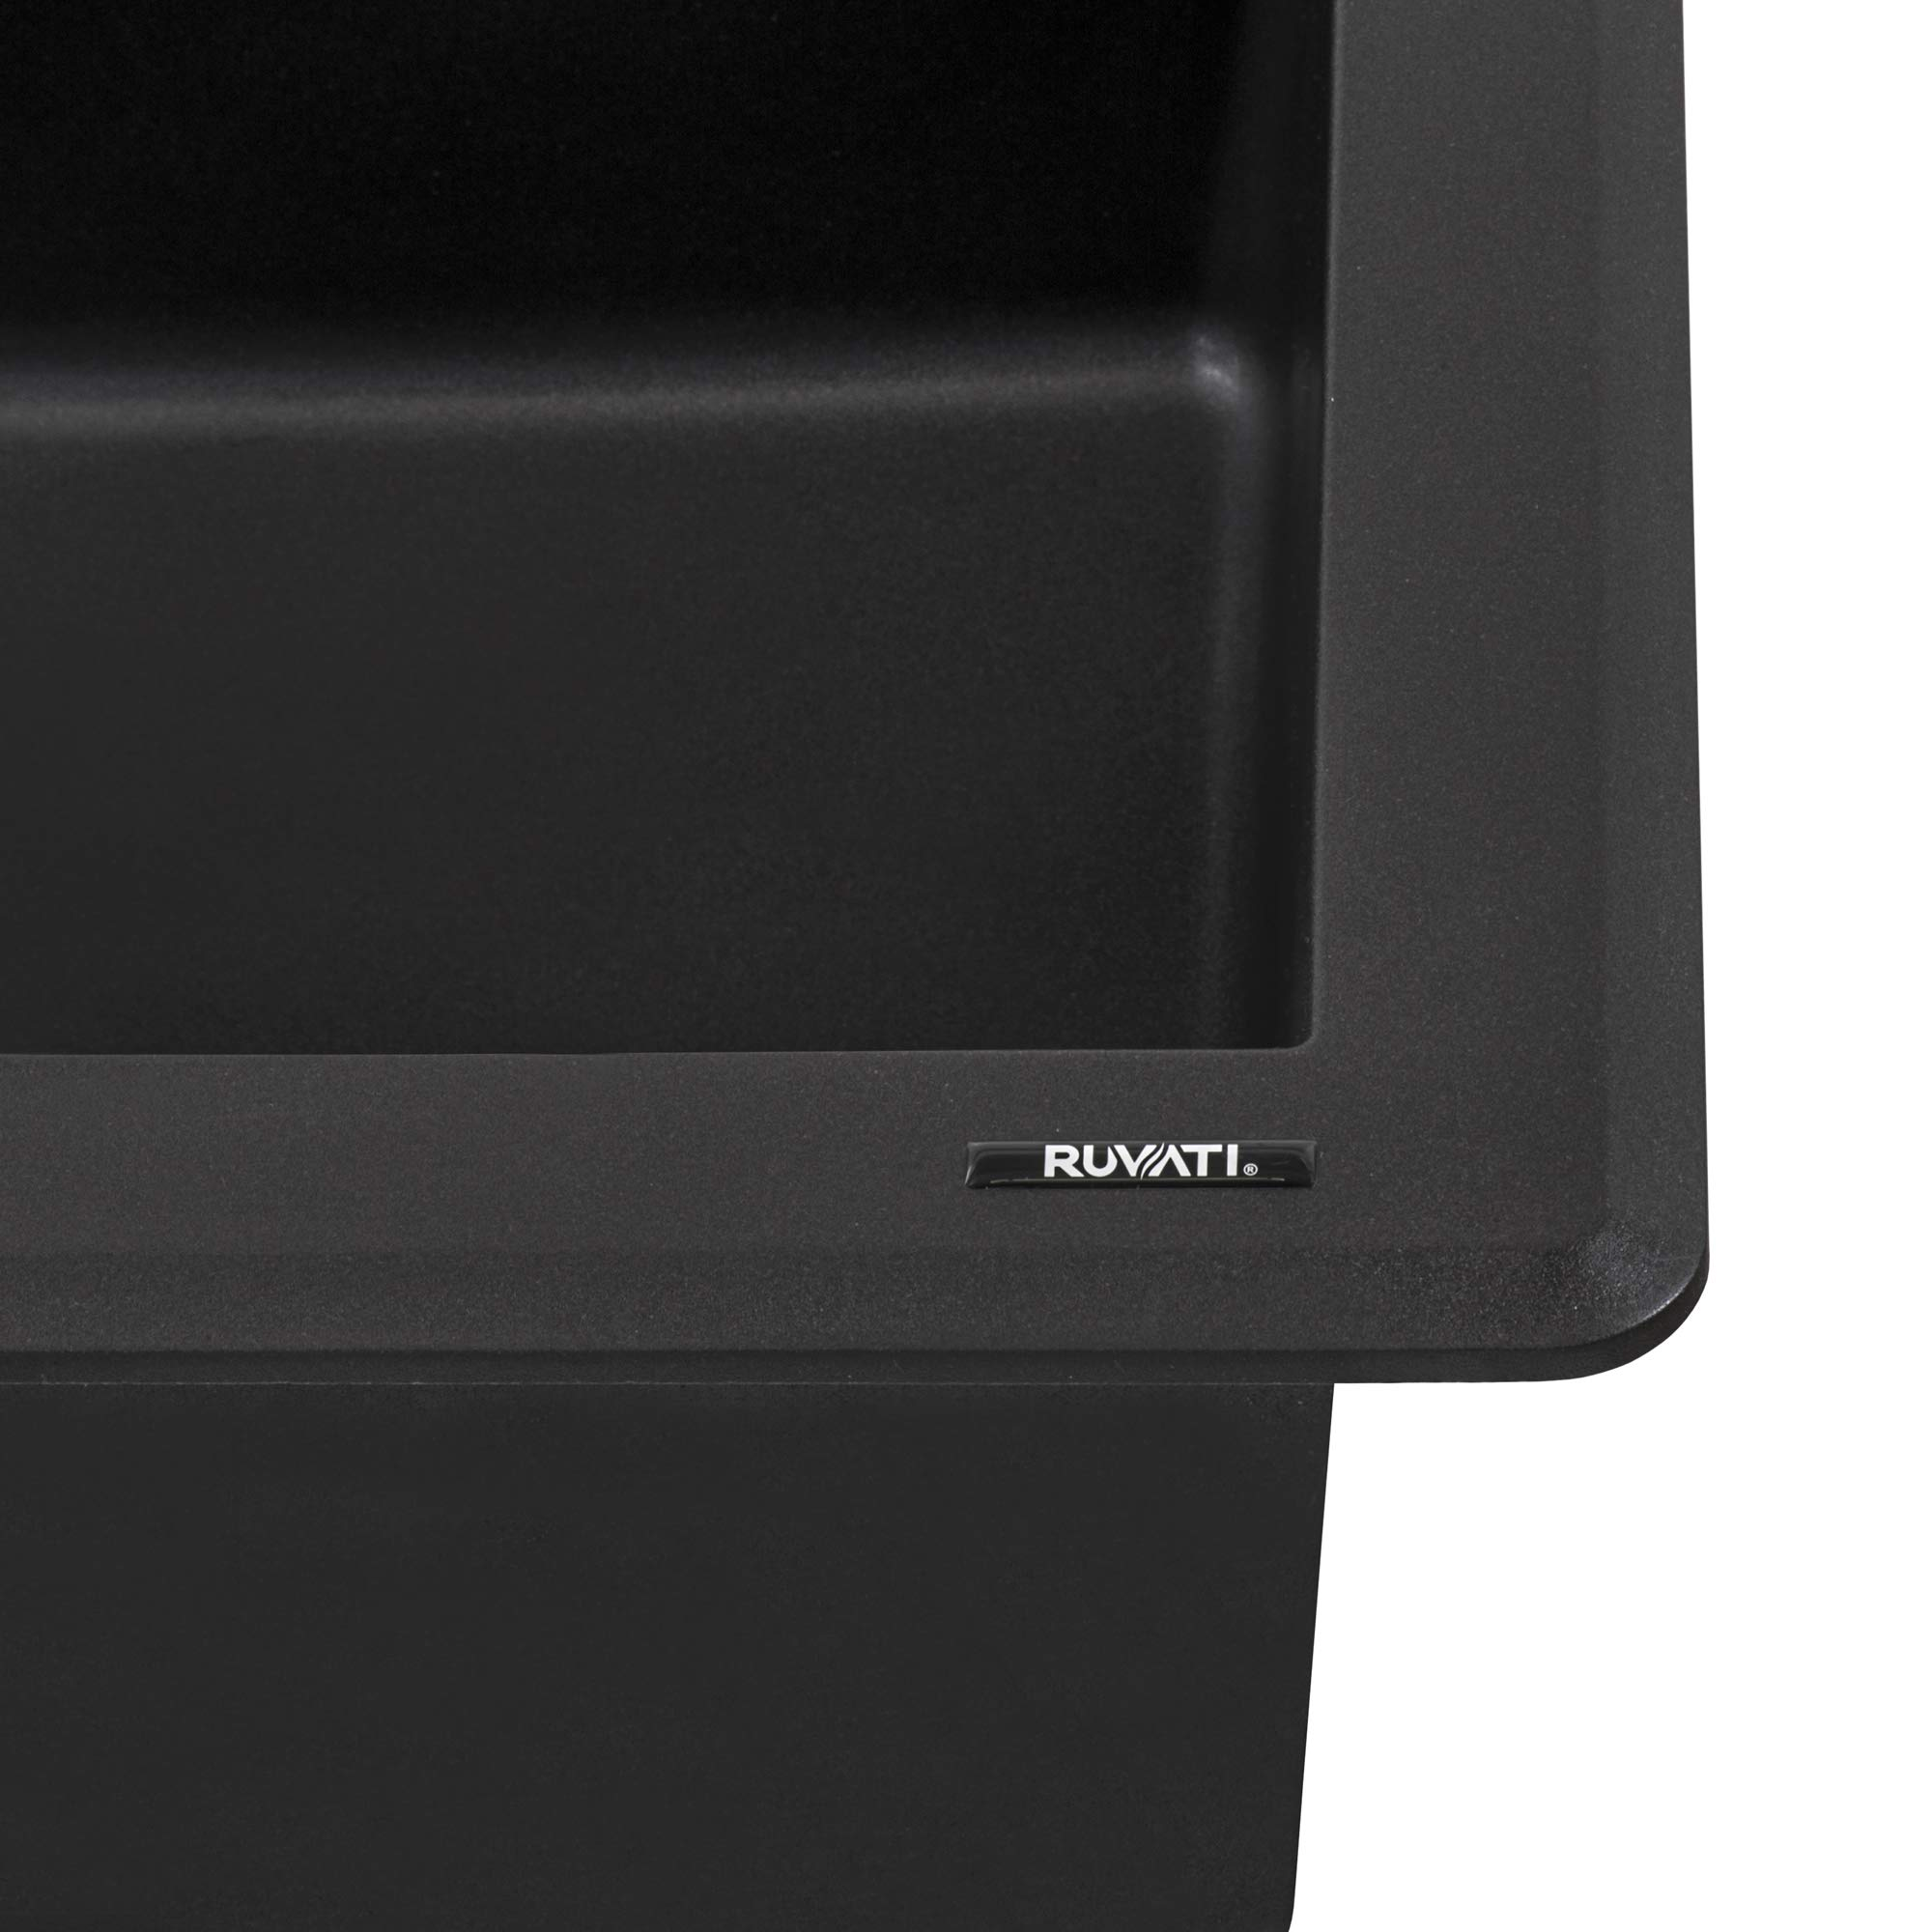 Ruvati 33 x 22 inch Dual-Mount Granite Composite Single Bowl Kitchen Sink - Midnight Black - RVG1033BK by Ruvati (Image #3)